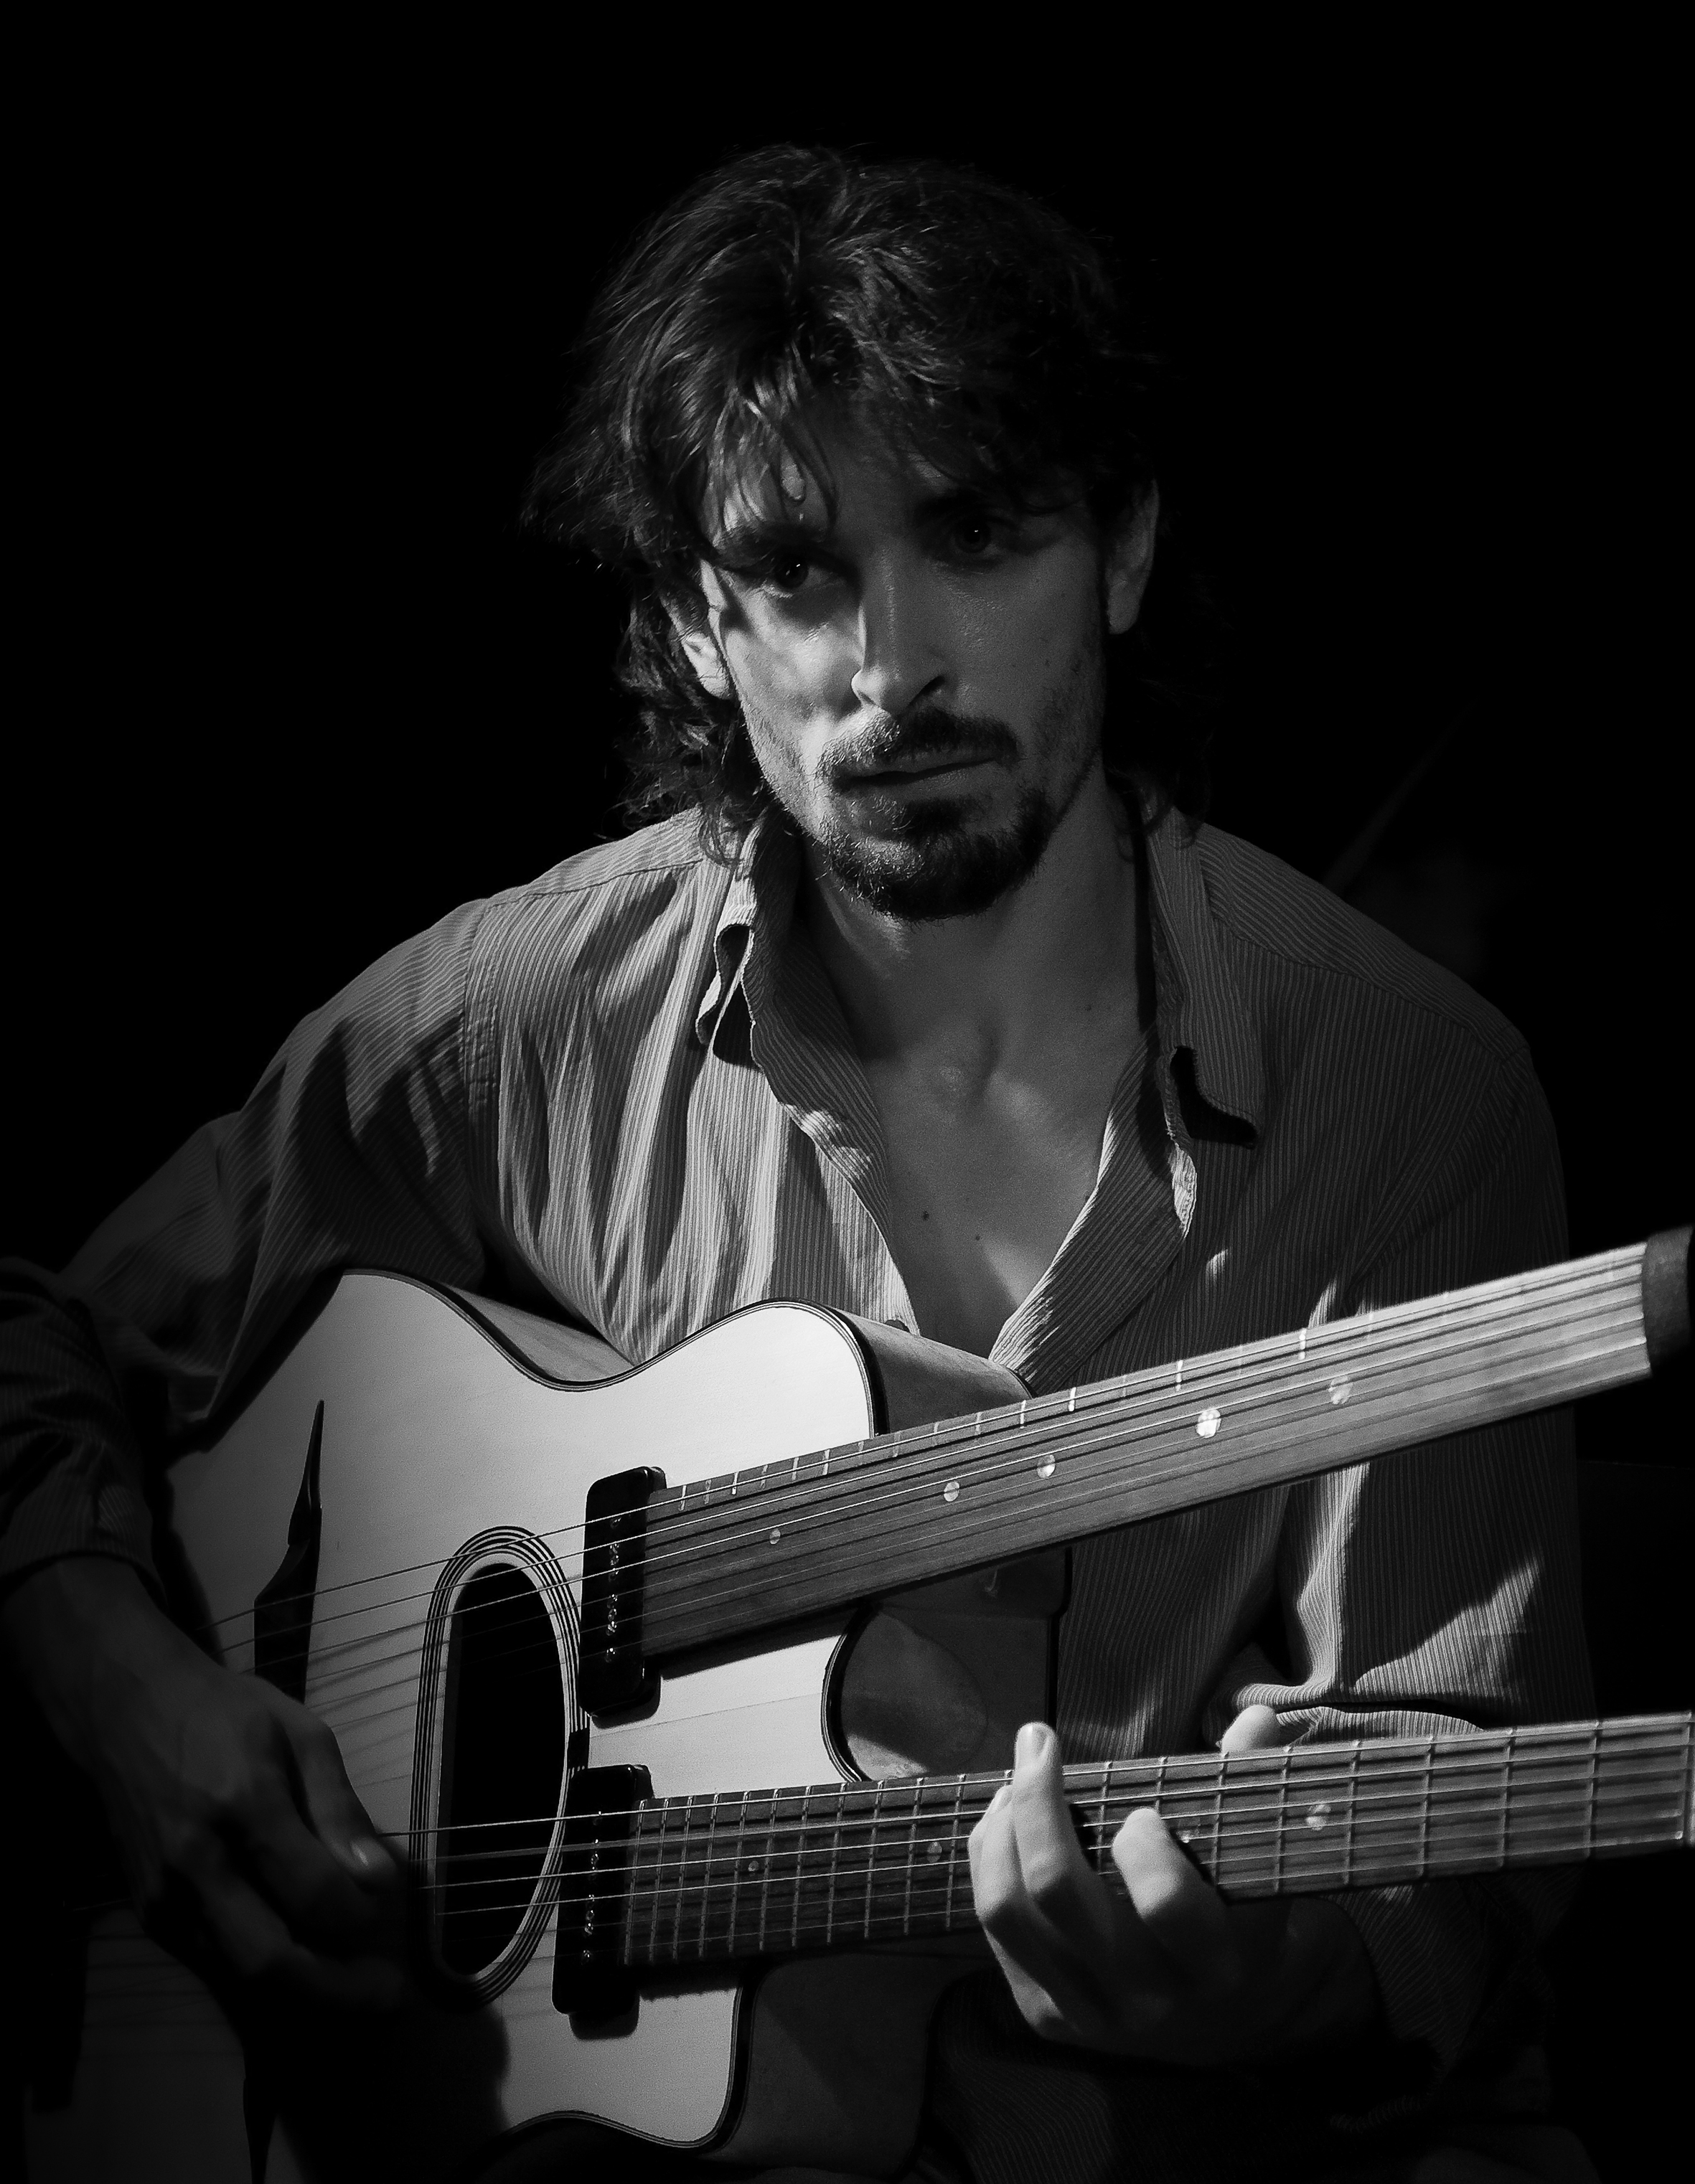 Tolga During Fretless guitar Live in Hungary